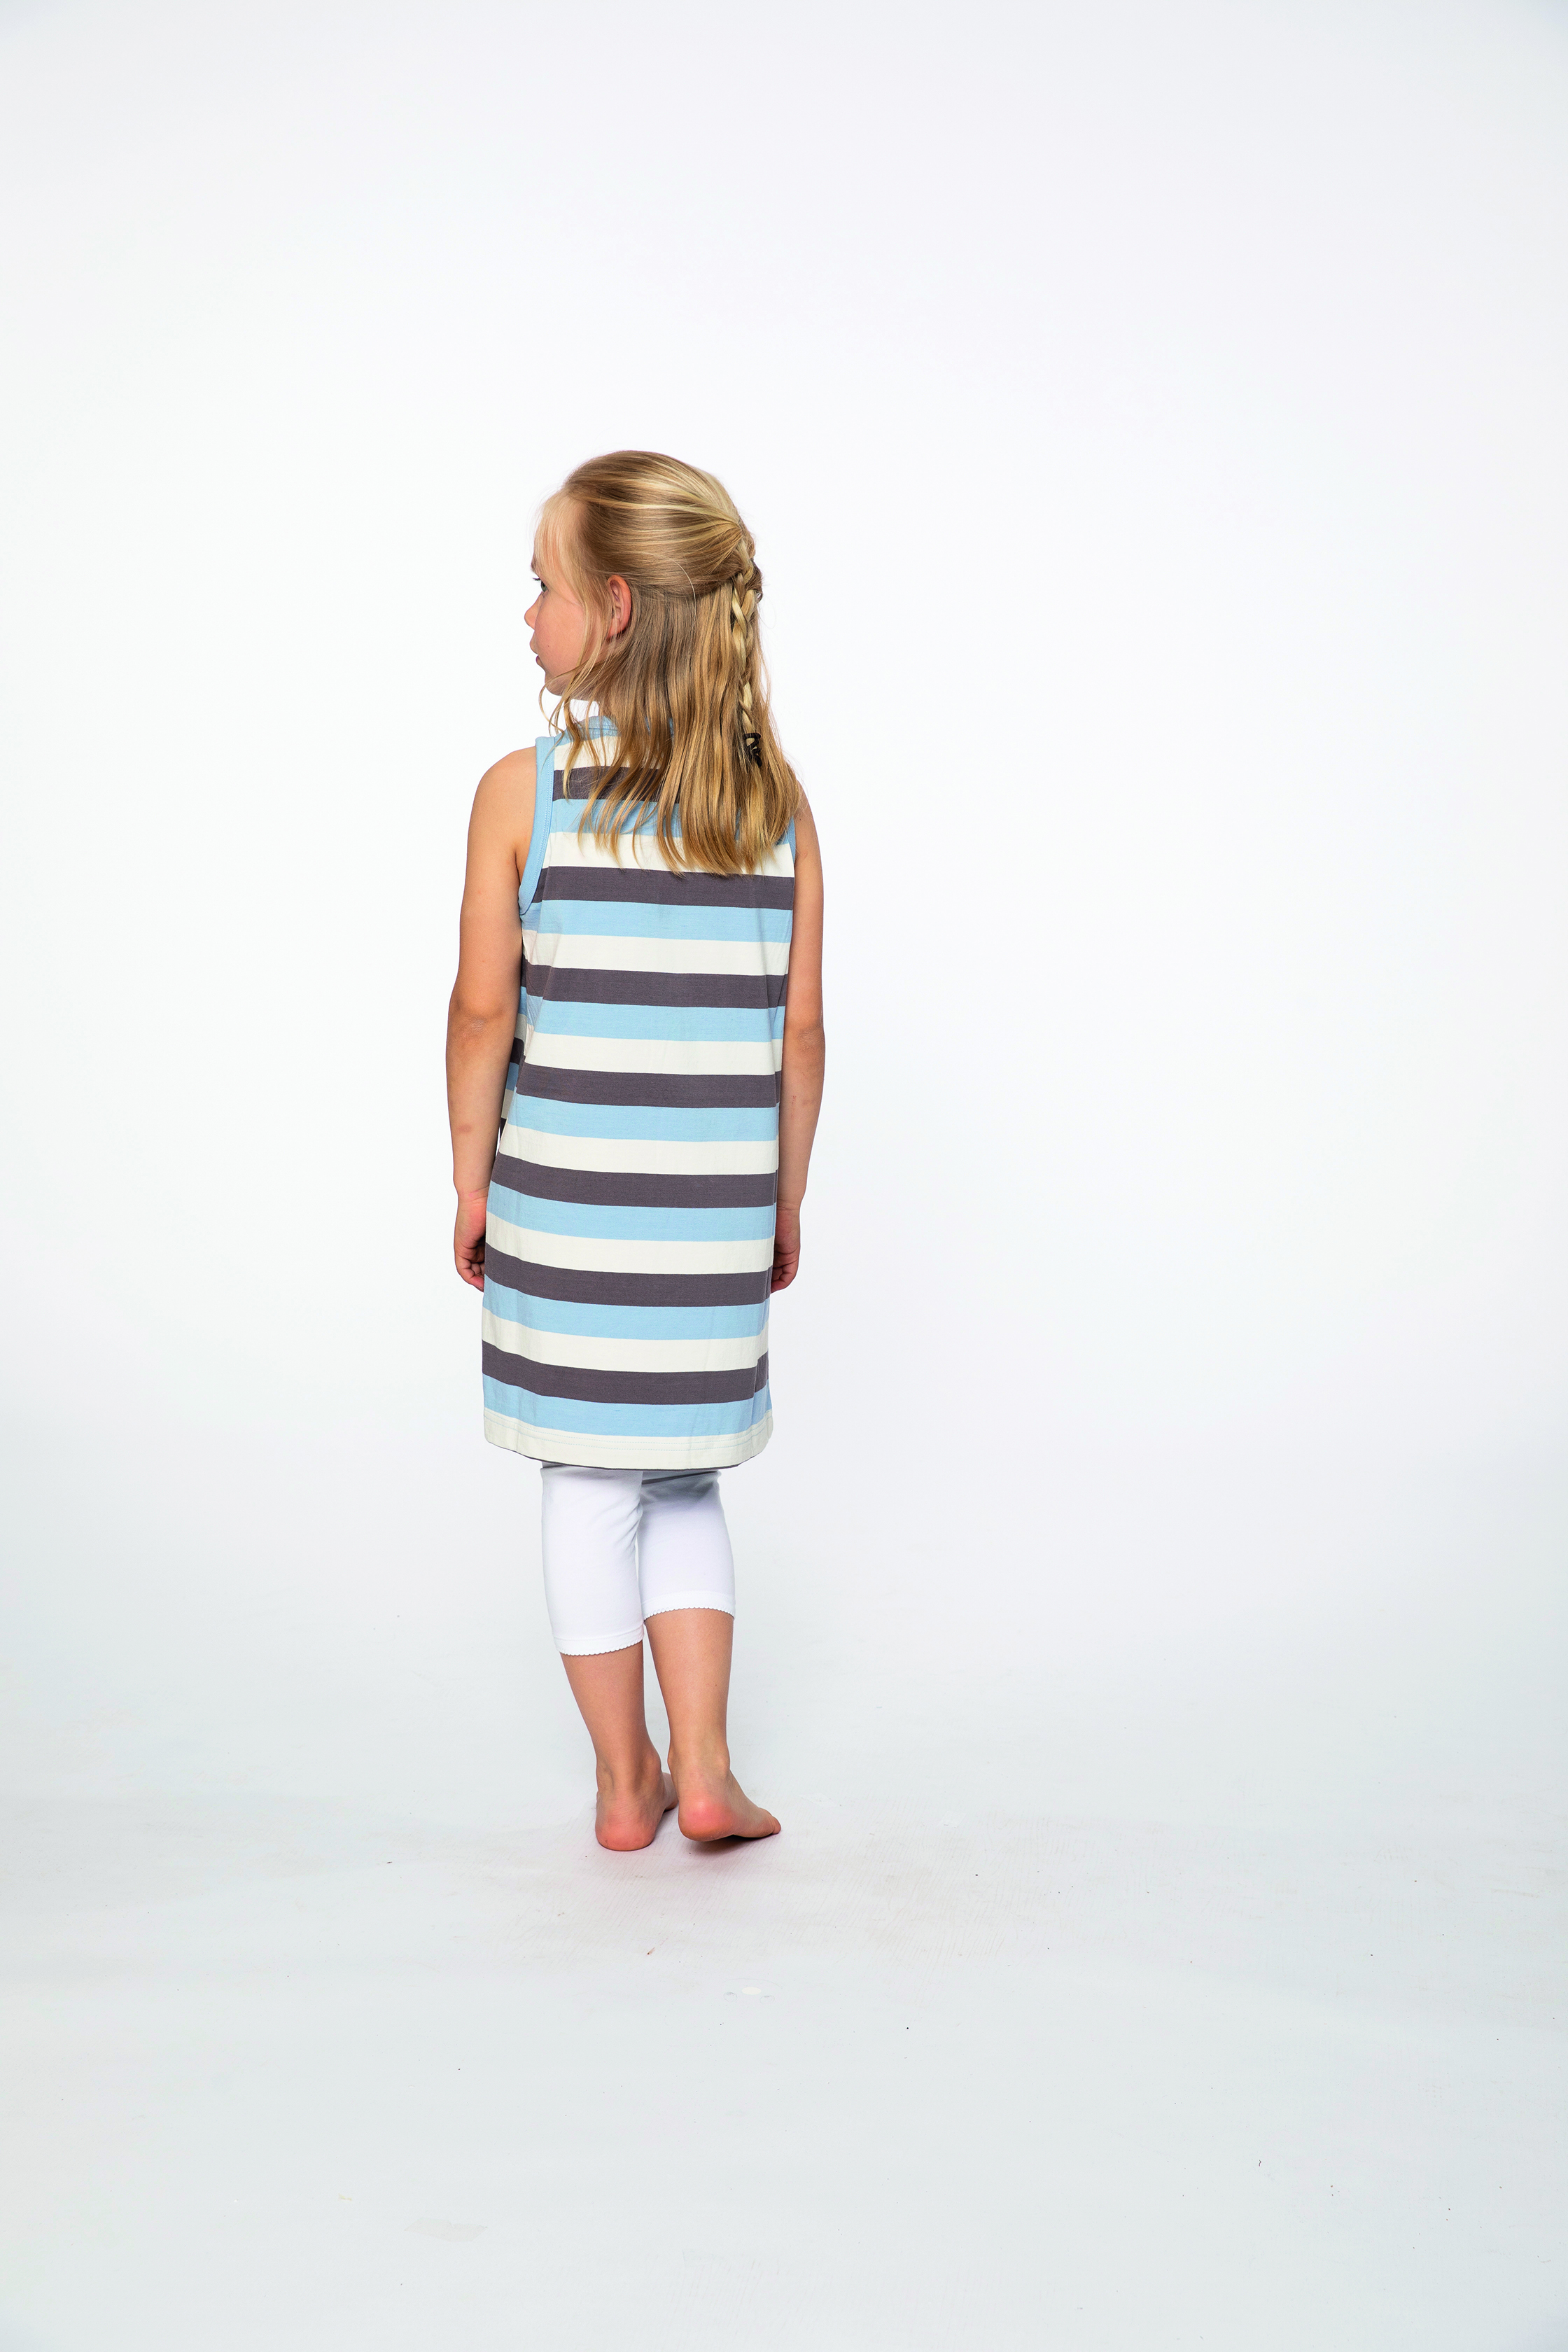 dress:  CURLED